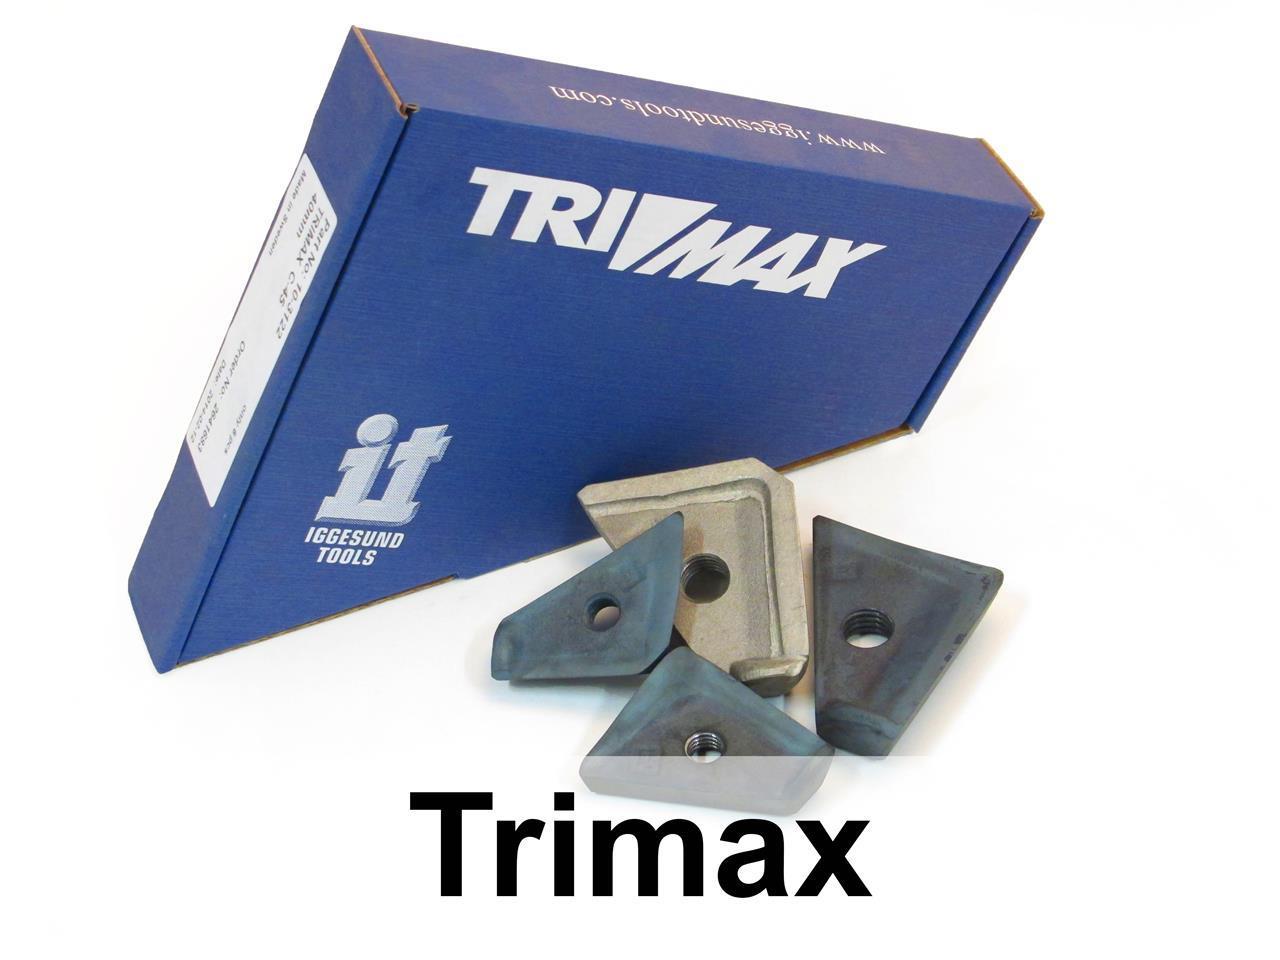 Trimax tips for Cambio Debarker